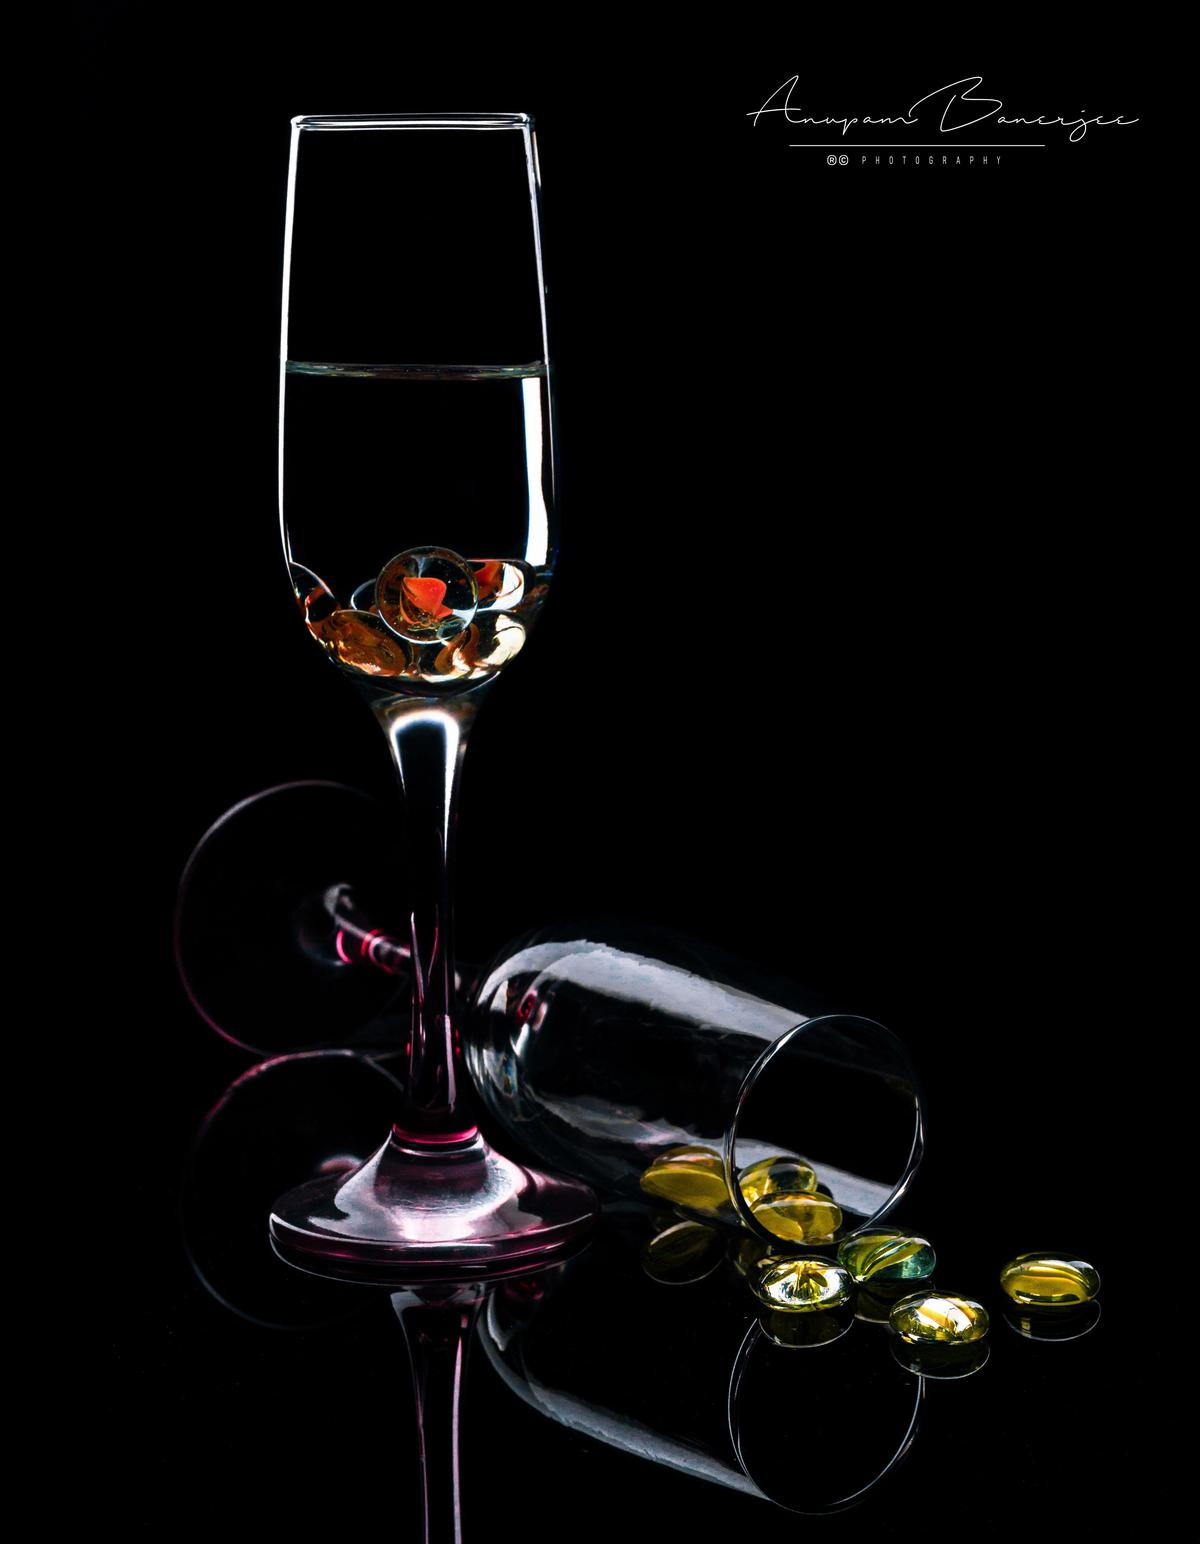 Image of Stemware, Wine glass, Champagne stemware, Glass, Drinkware, Still life photography etc.